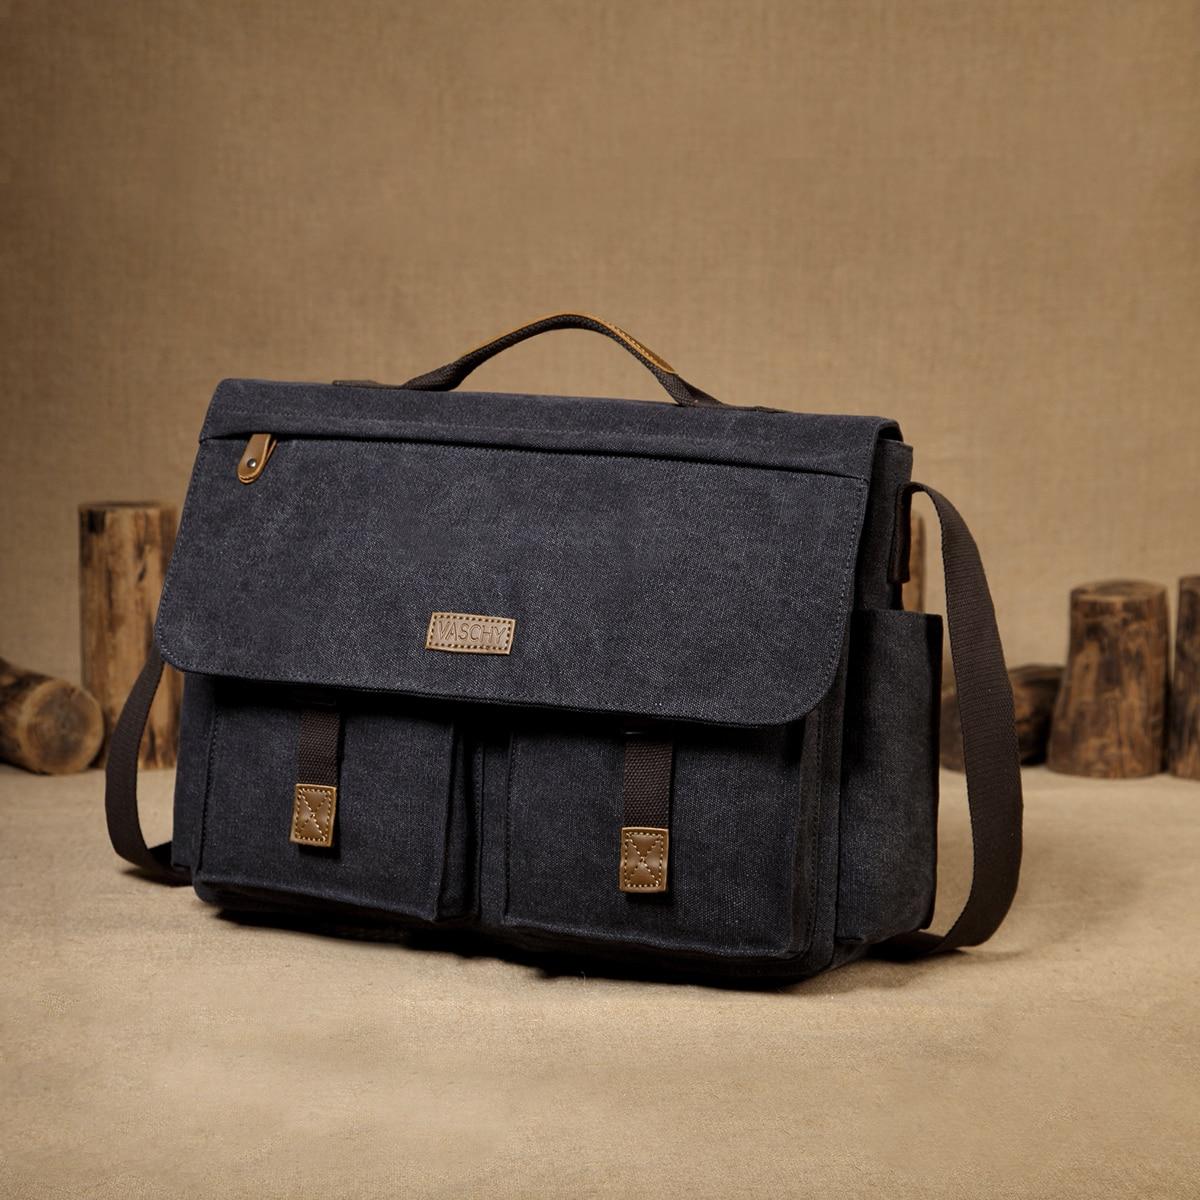 H9f656e831c5e488cb458de520bcfbdceL VASCHY Messenger Bag for Men Vintage Water Resistant Waxed Canvas 15.6 inch Laptop Briefcase Padded Shoulder Bag for Men Women